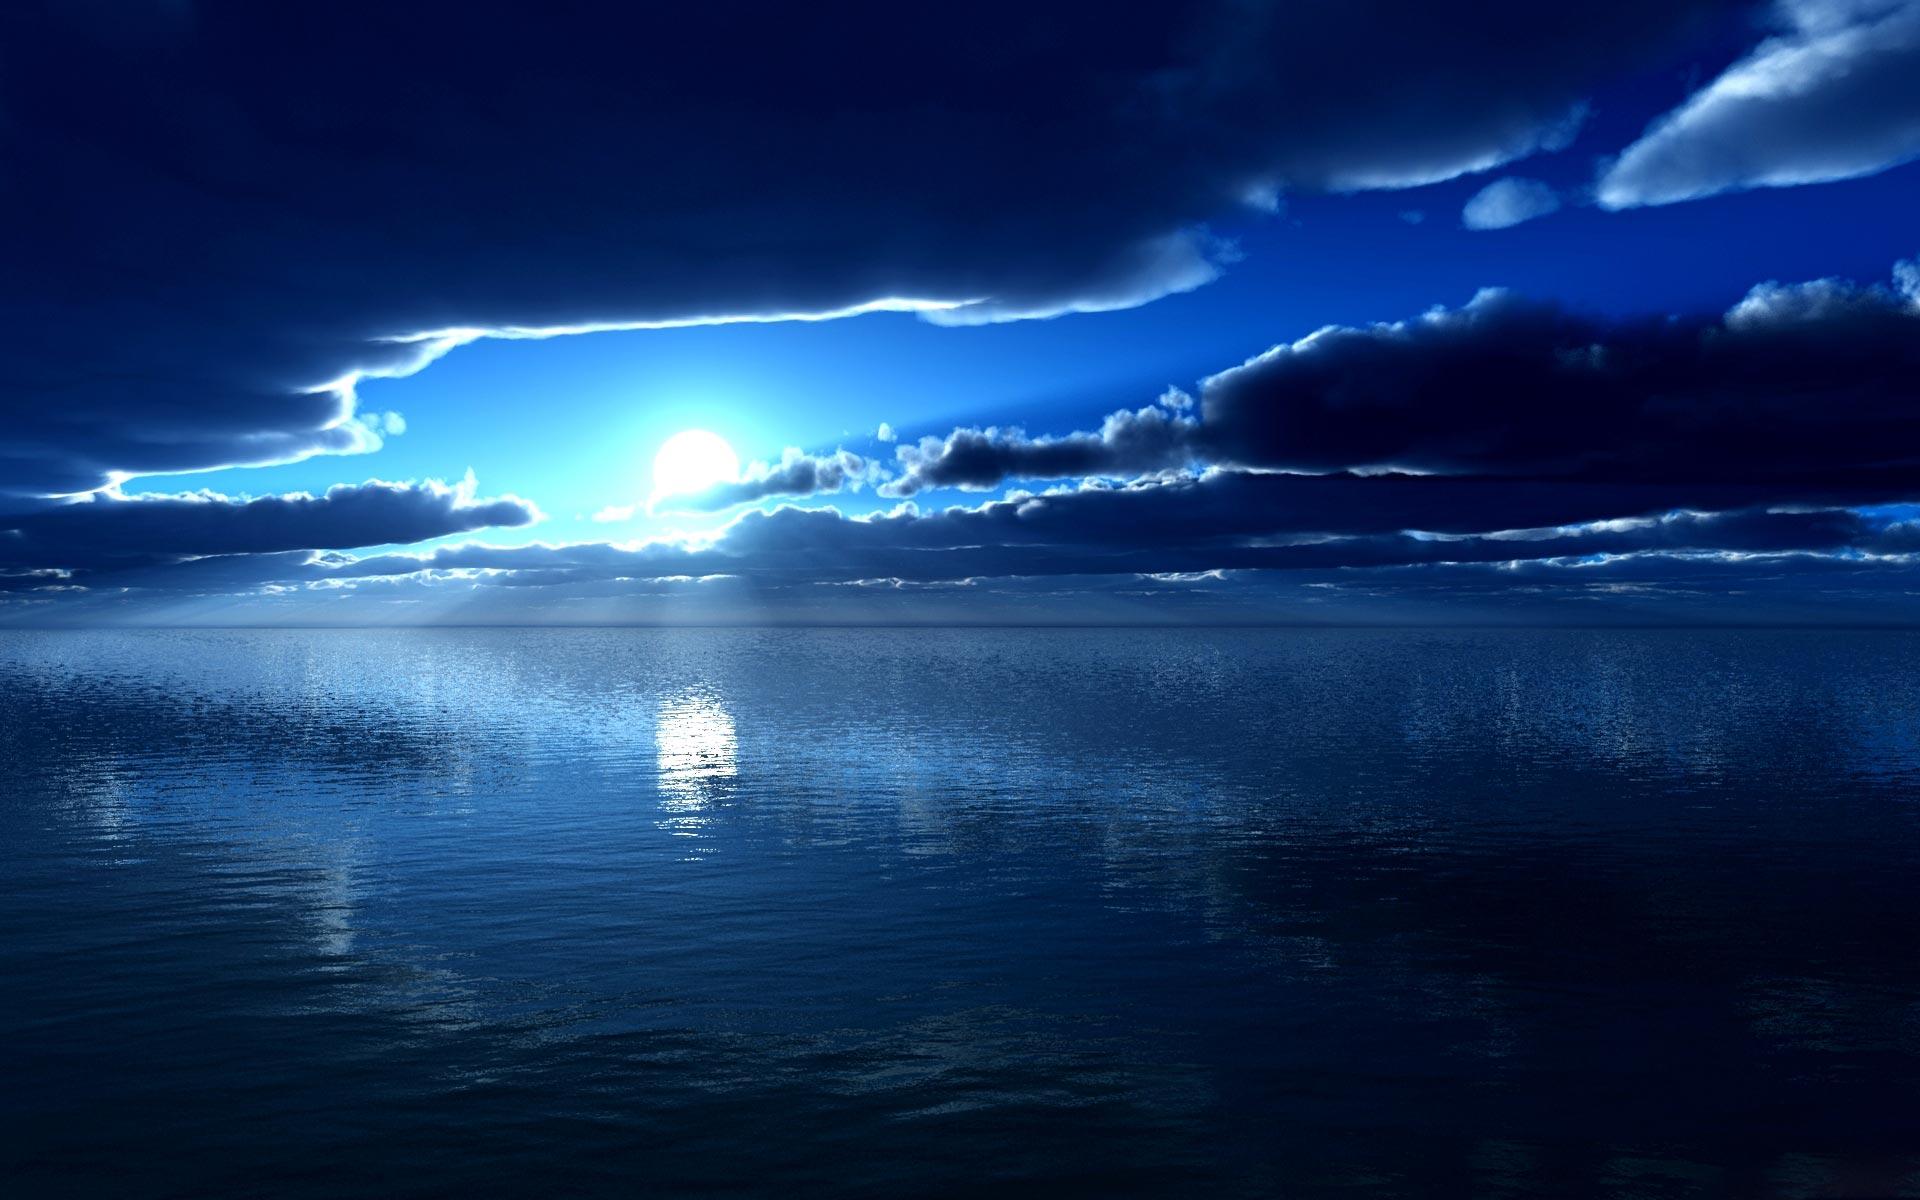 1438 ocean hd wallpapers - photo #13